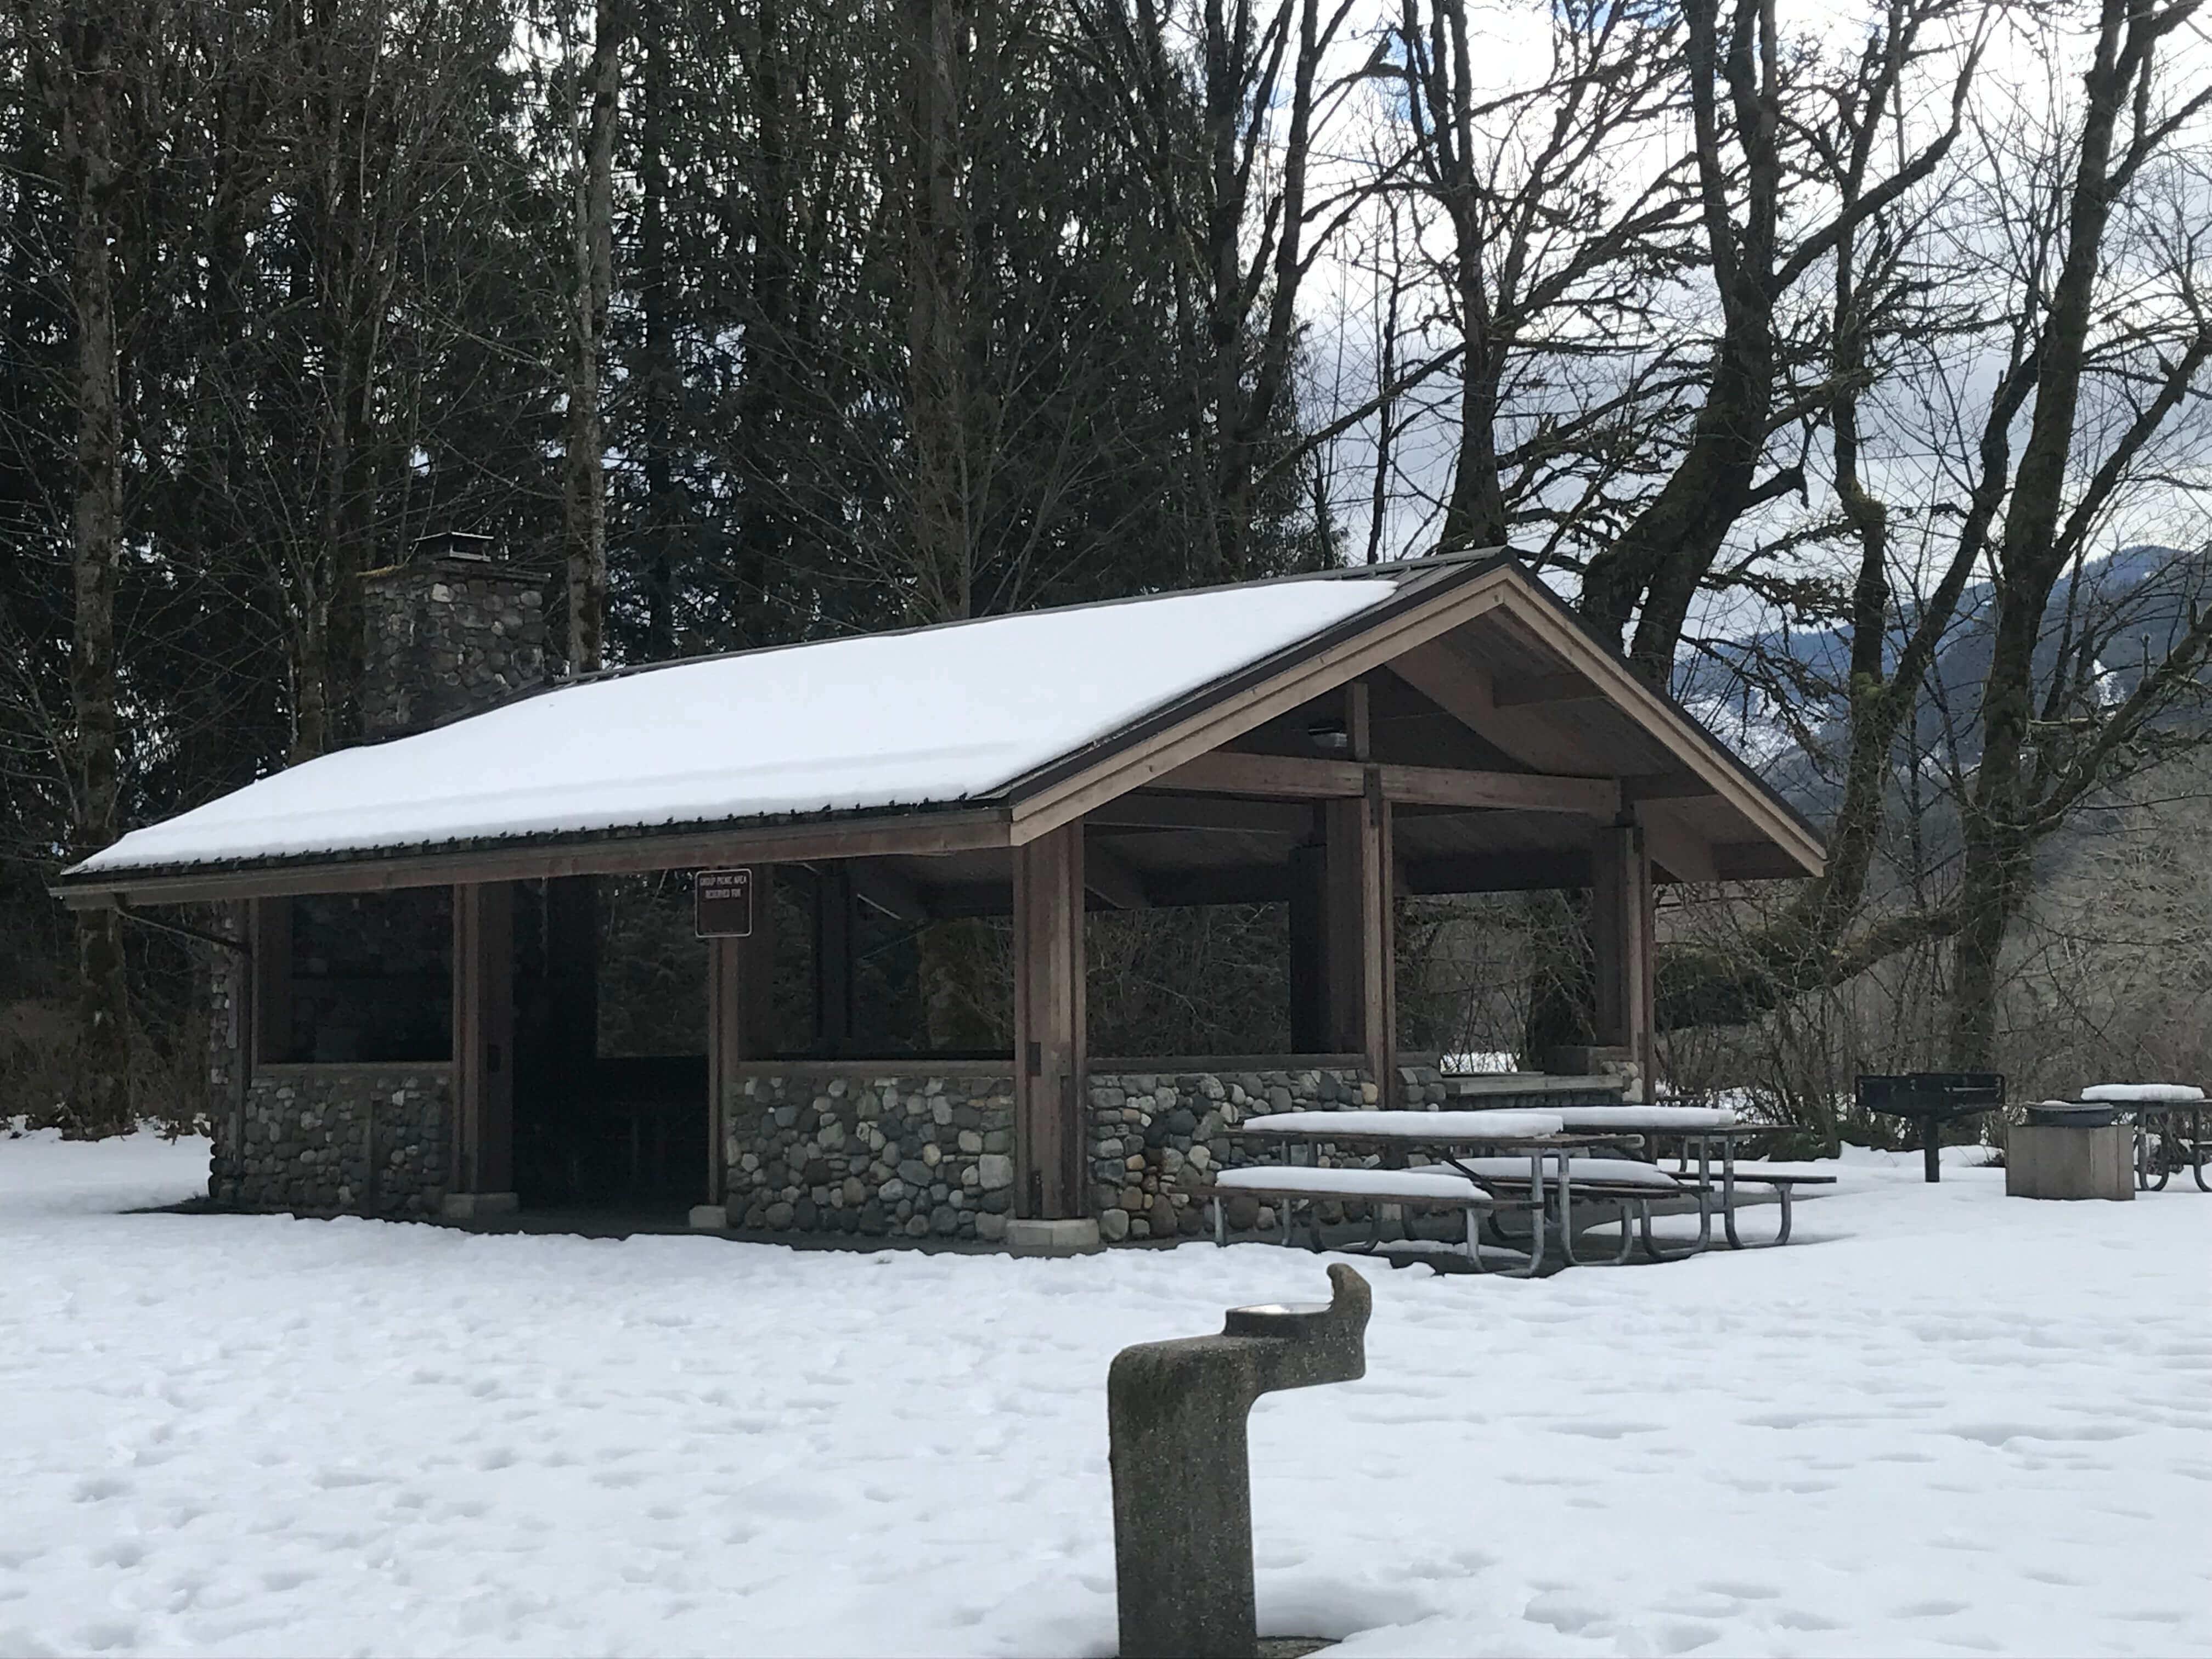 Rasar State Park, Skagit County<br>Stephen Story, Architect